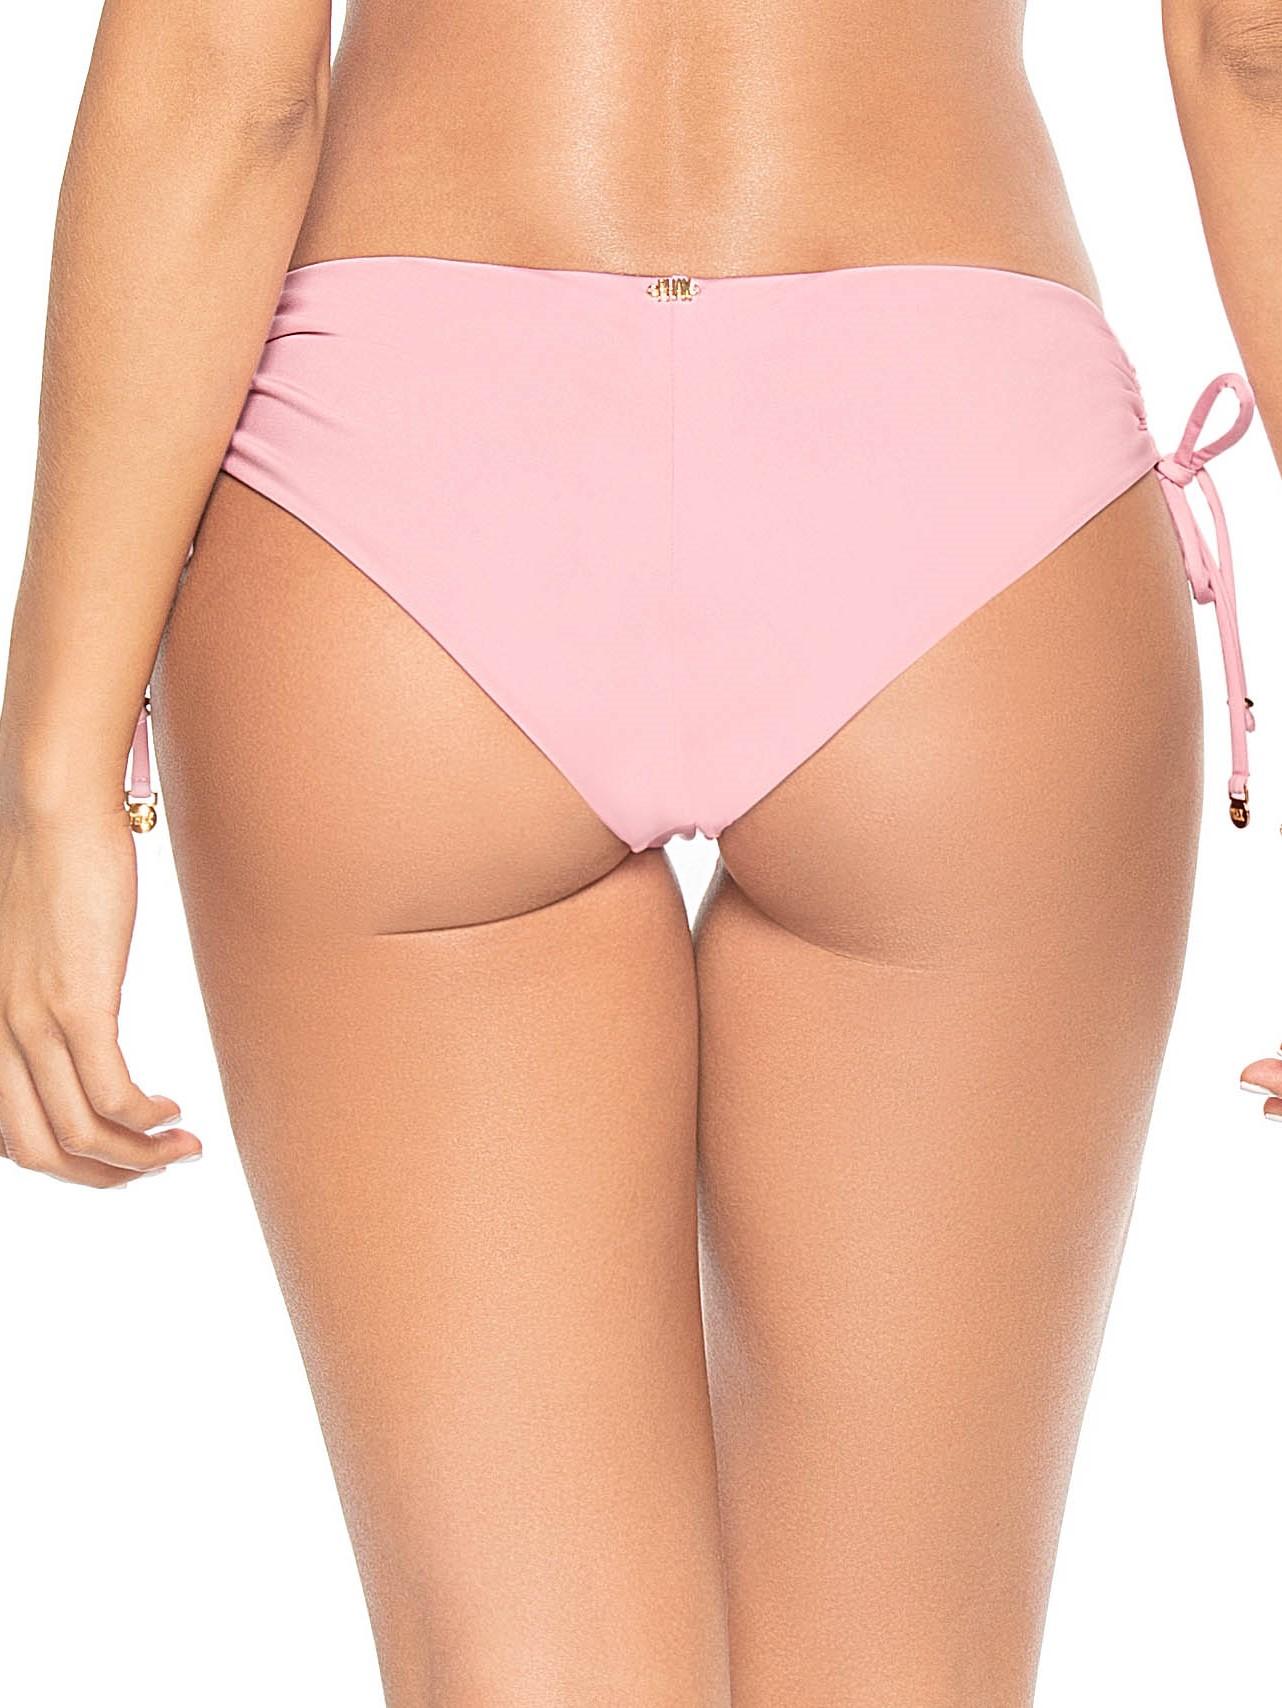 Phax Light Pink Cheeky Bikini Bottom